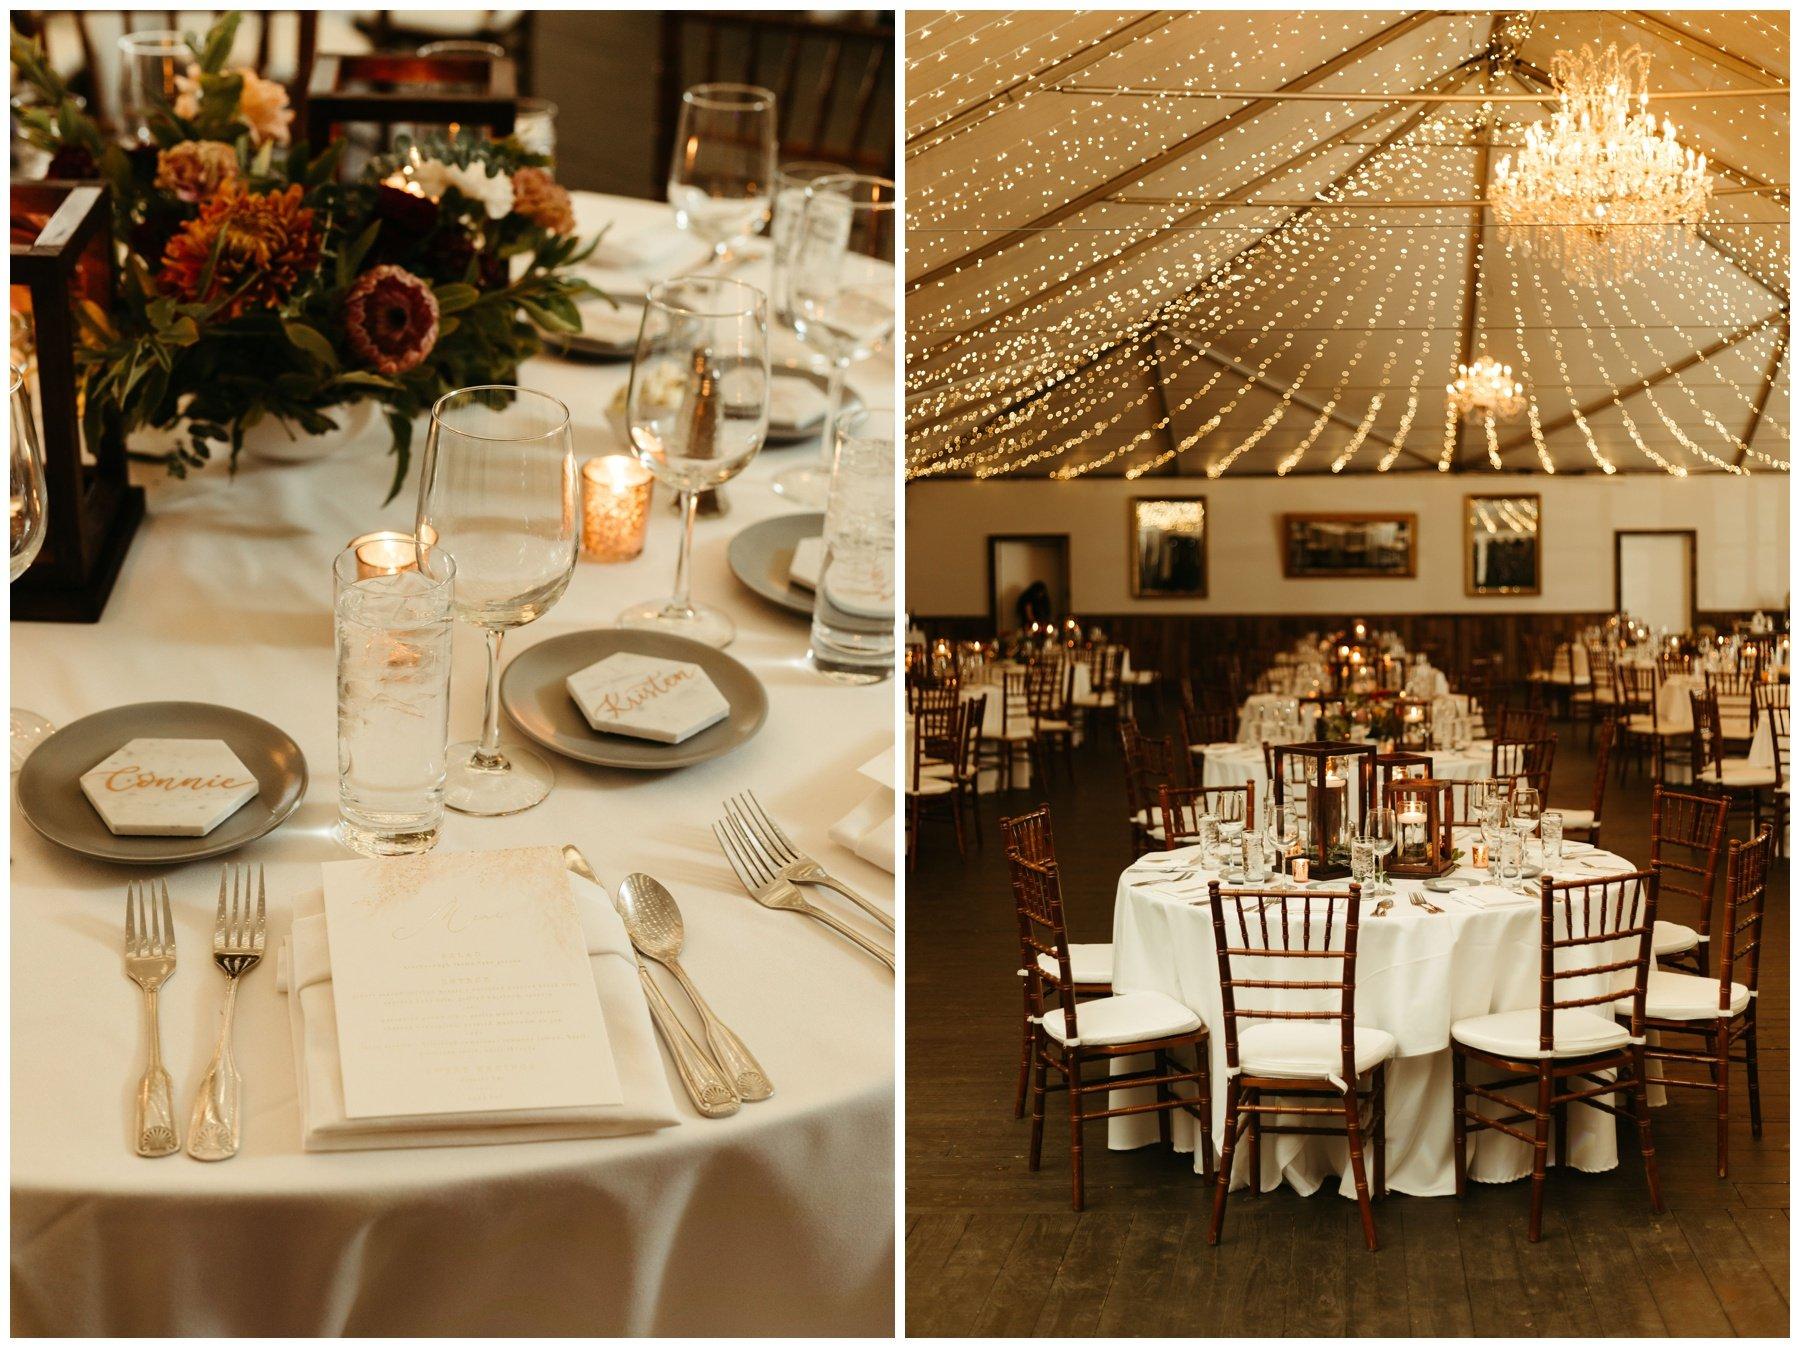 wedding reception decor with string lights